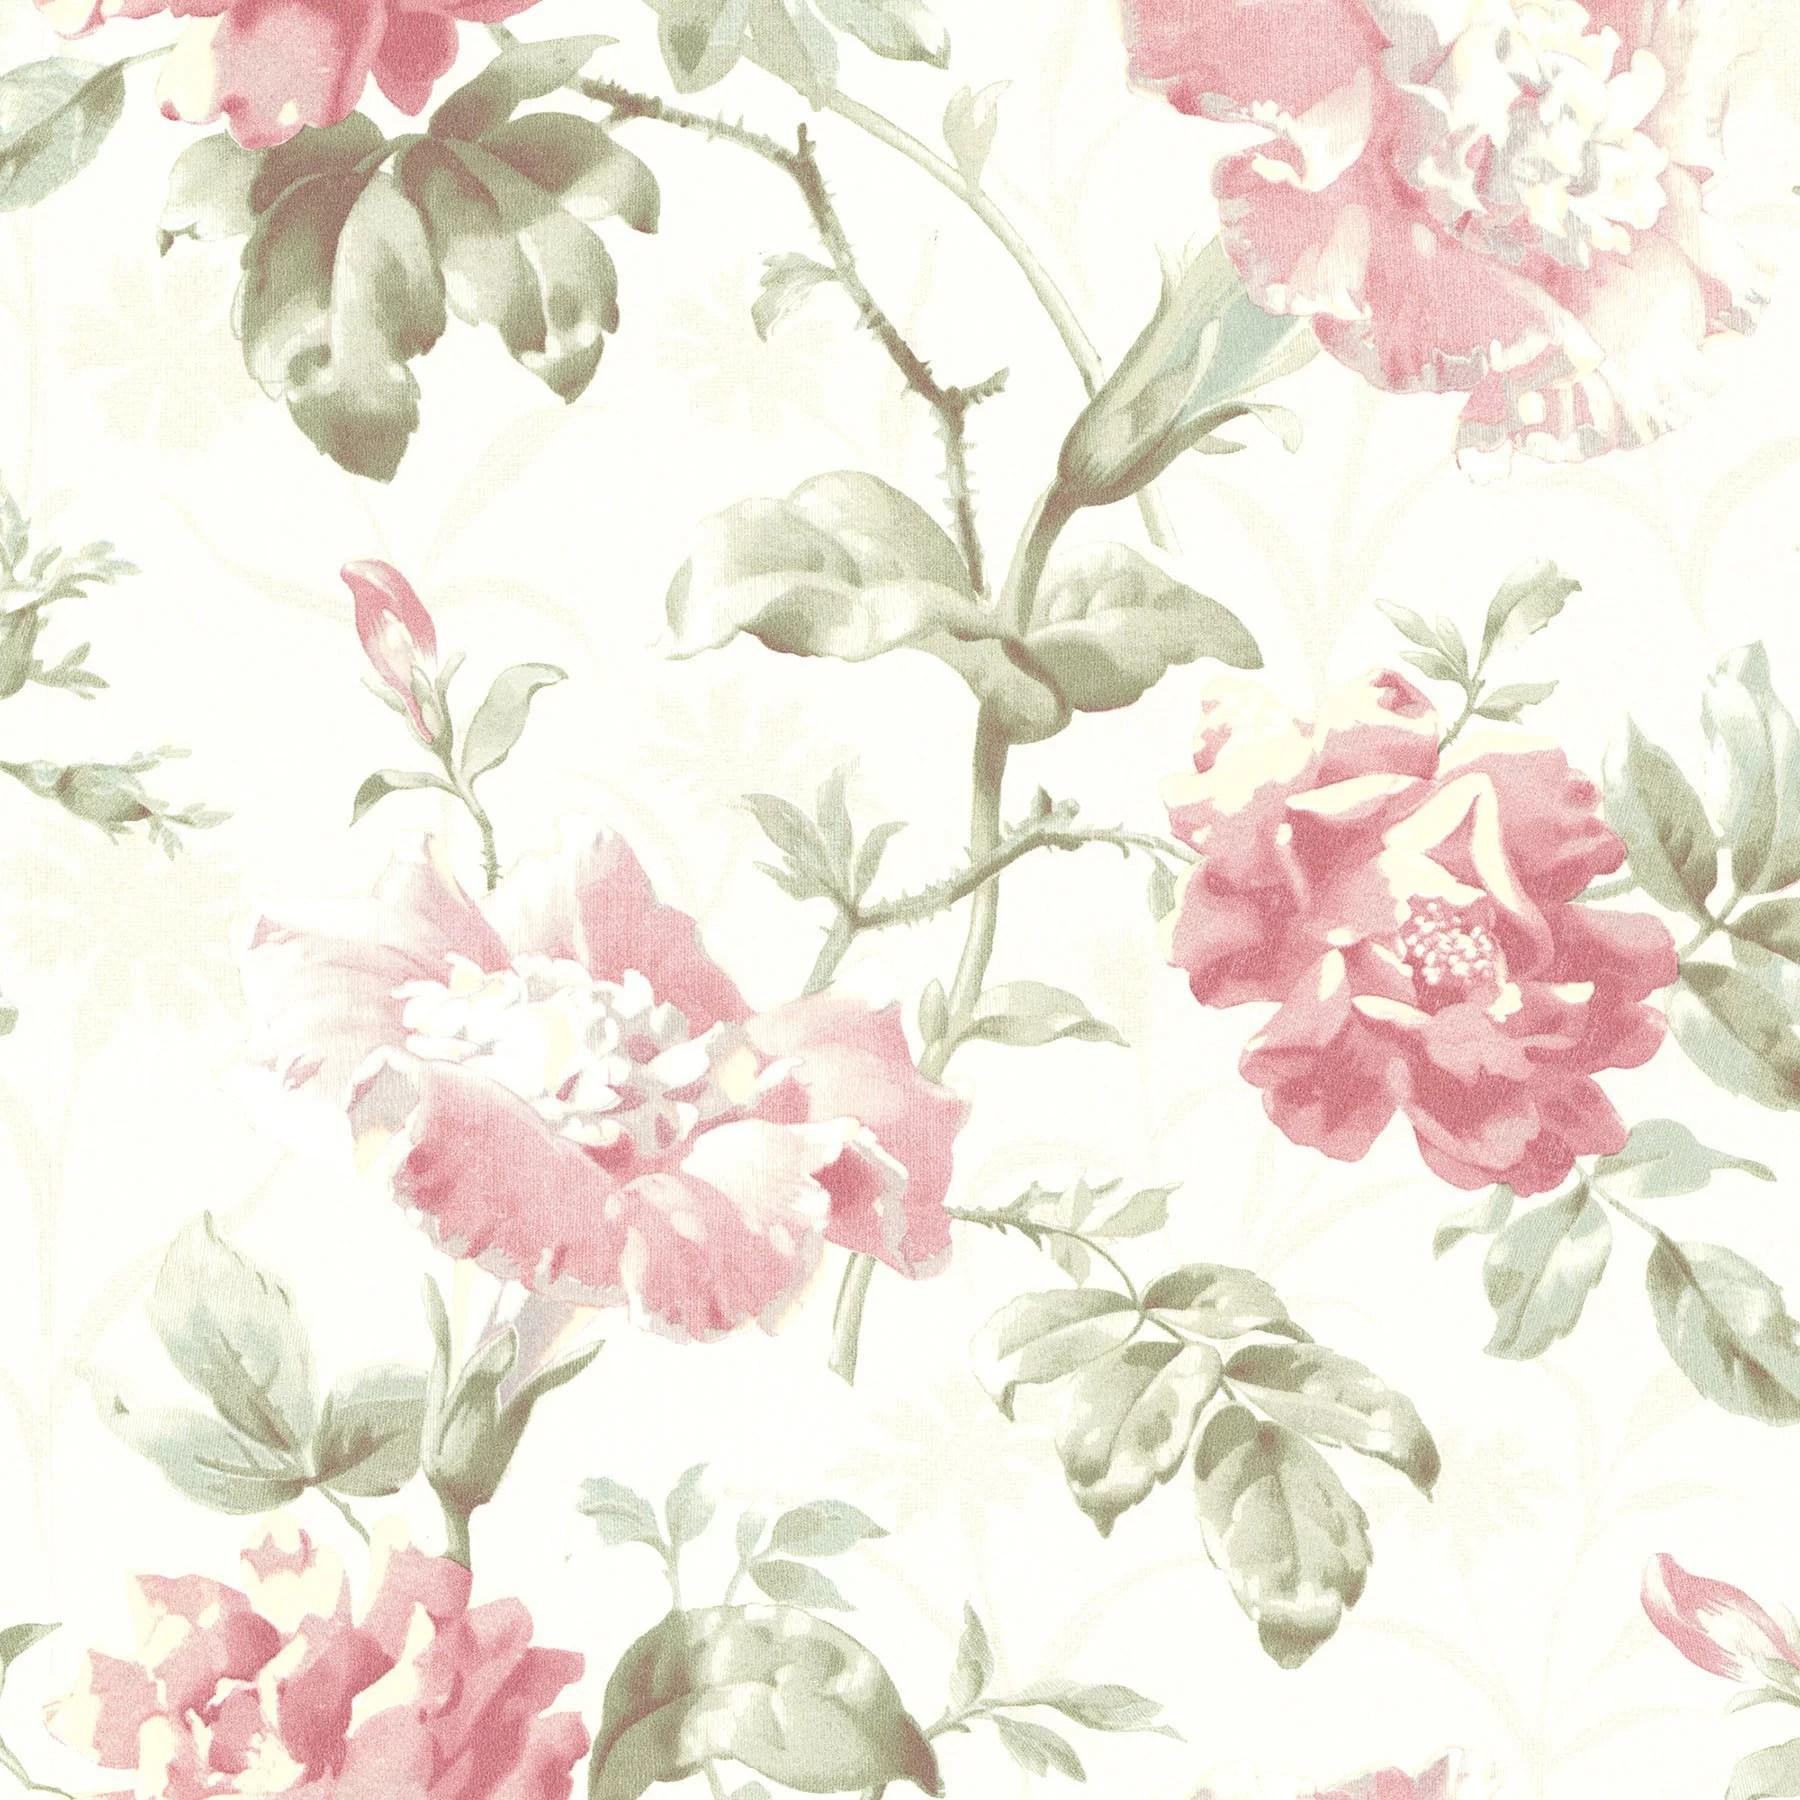 Beacon House Juliana Rose Vintage Floral Wallpaper Walmart Com Walmart Com